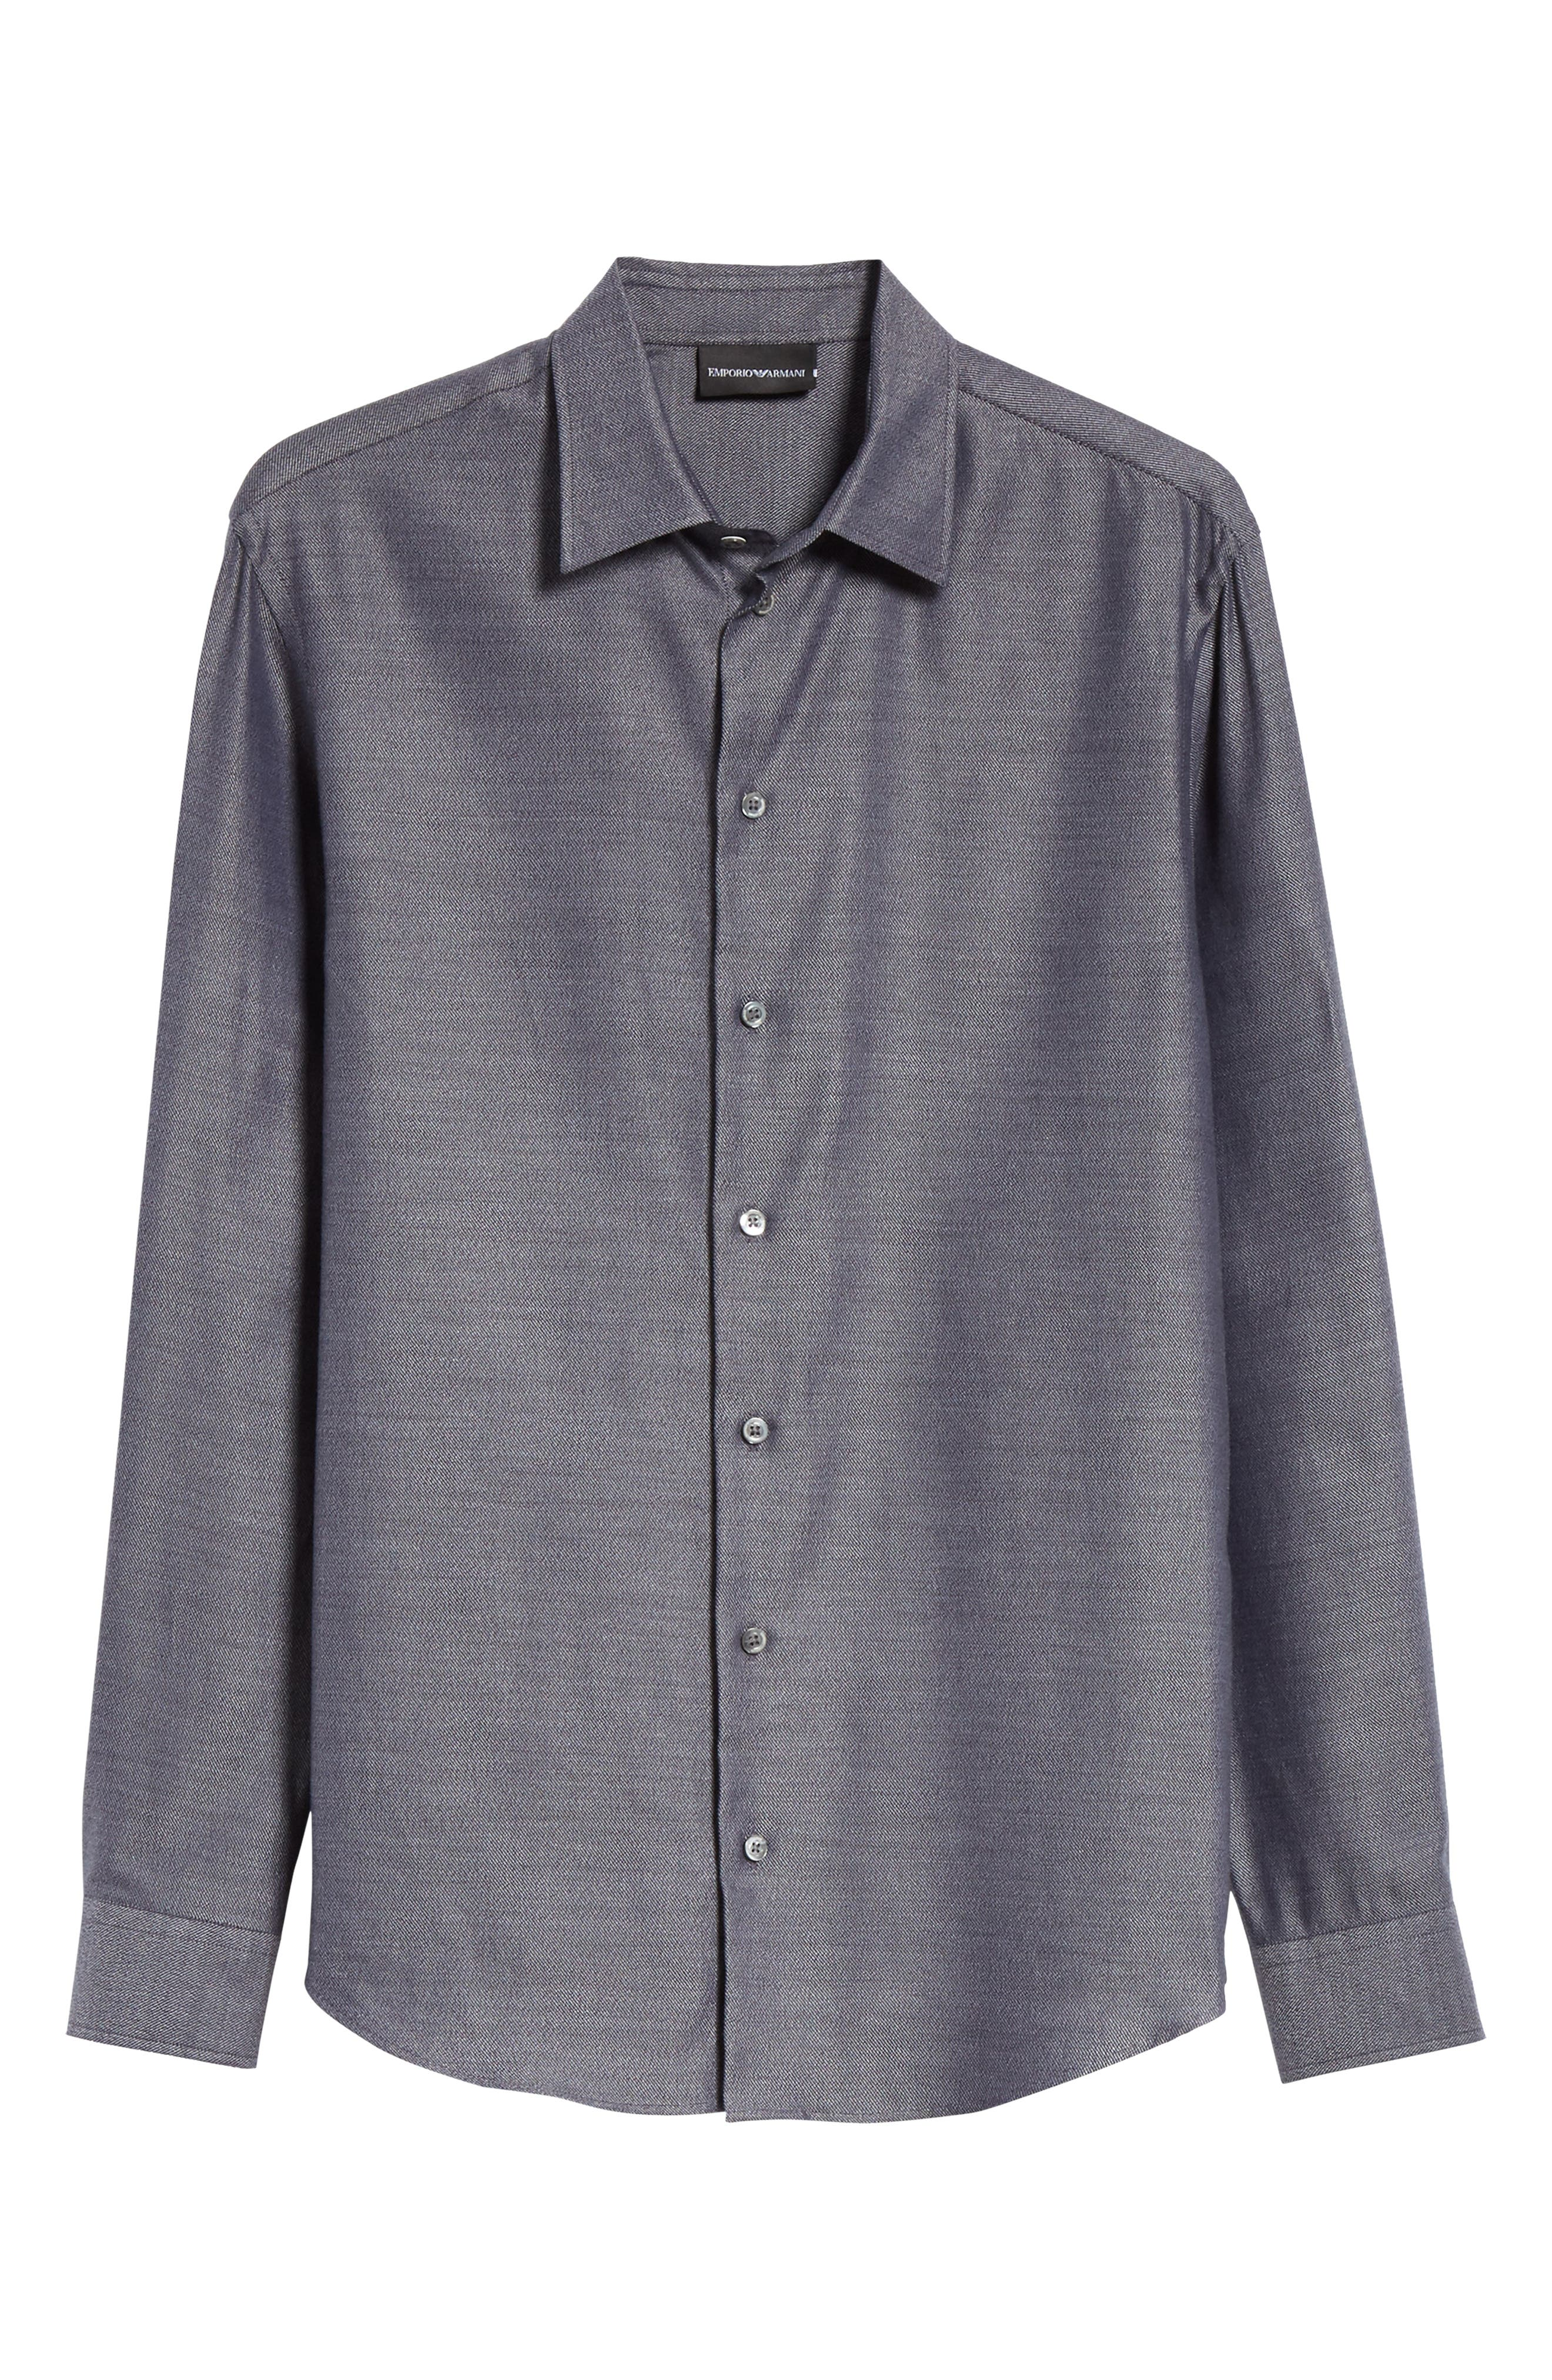 Regular Fit Twill Sport Shirt,                             Alternate thumbnail 6, color,                             GREY MULTI